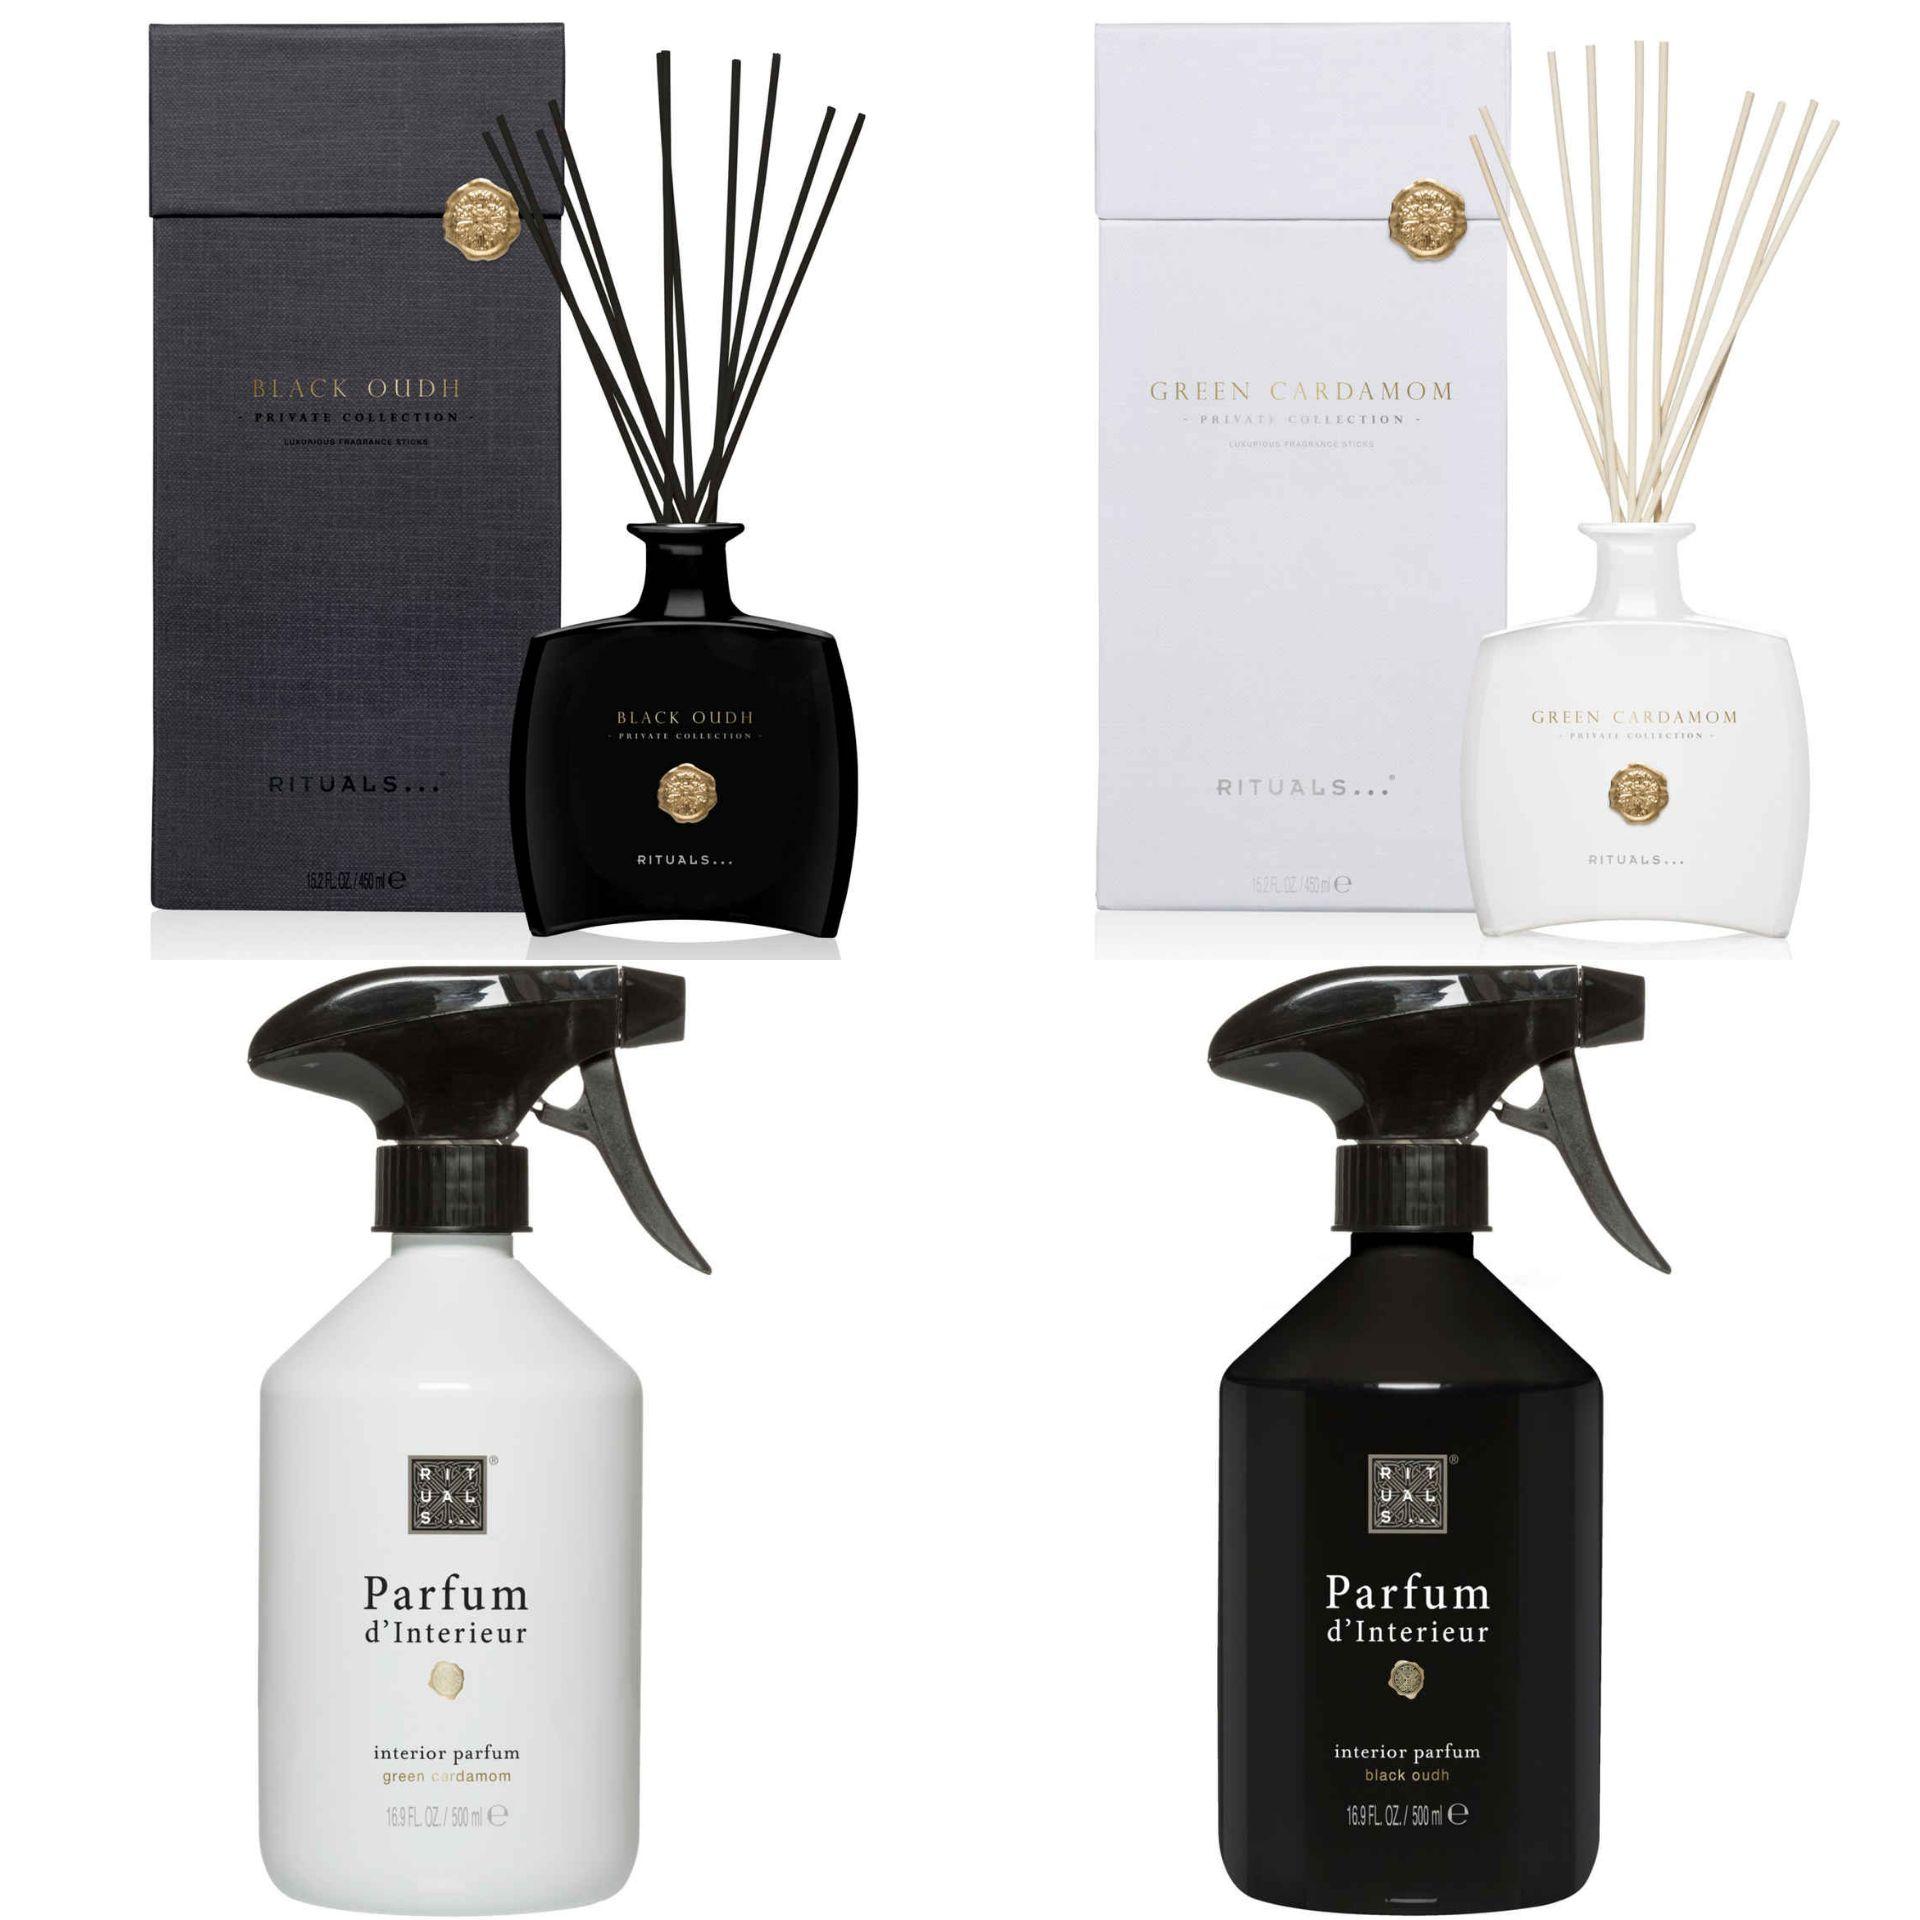 Rituals Private collection SALE (Black Oudh, Goji Berry, Green Cardamom, Wild Fig) @Hudson's Bay